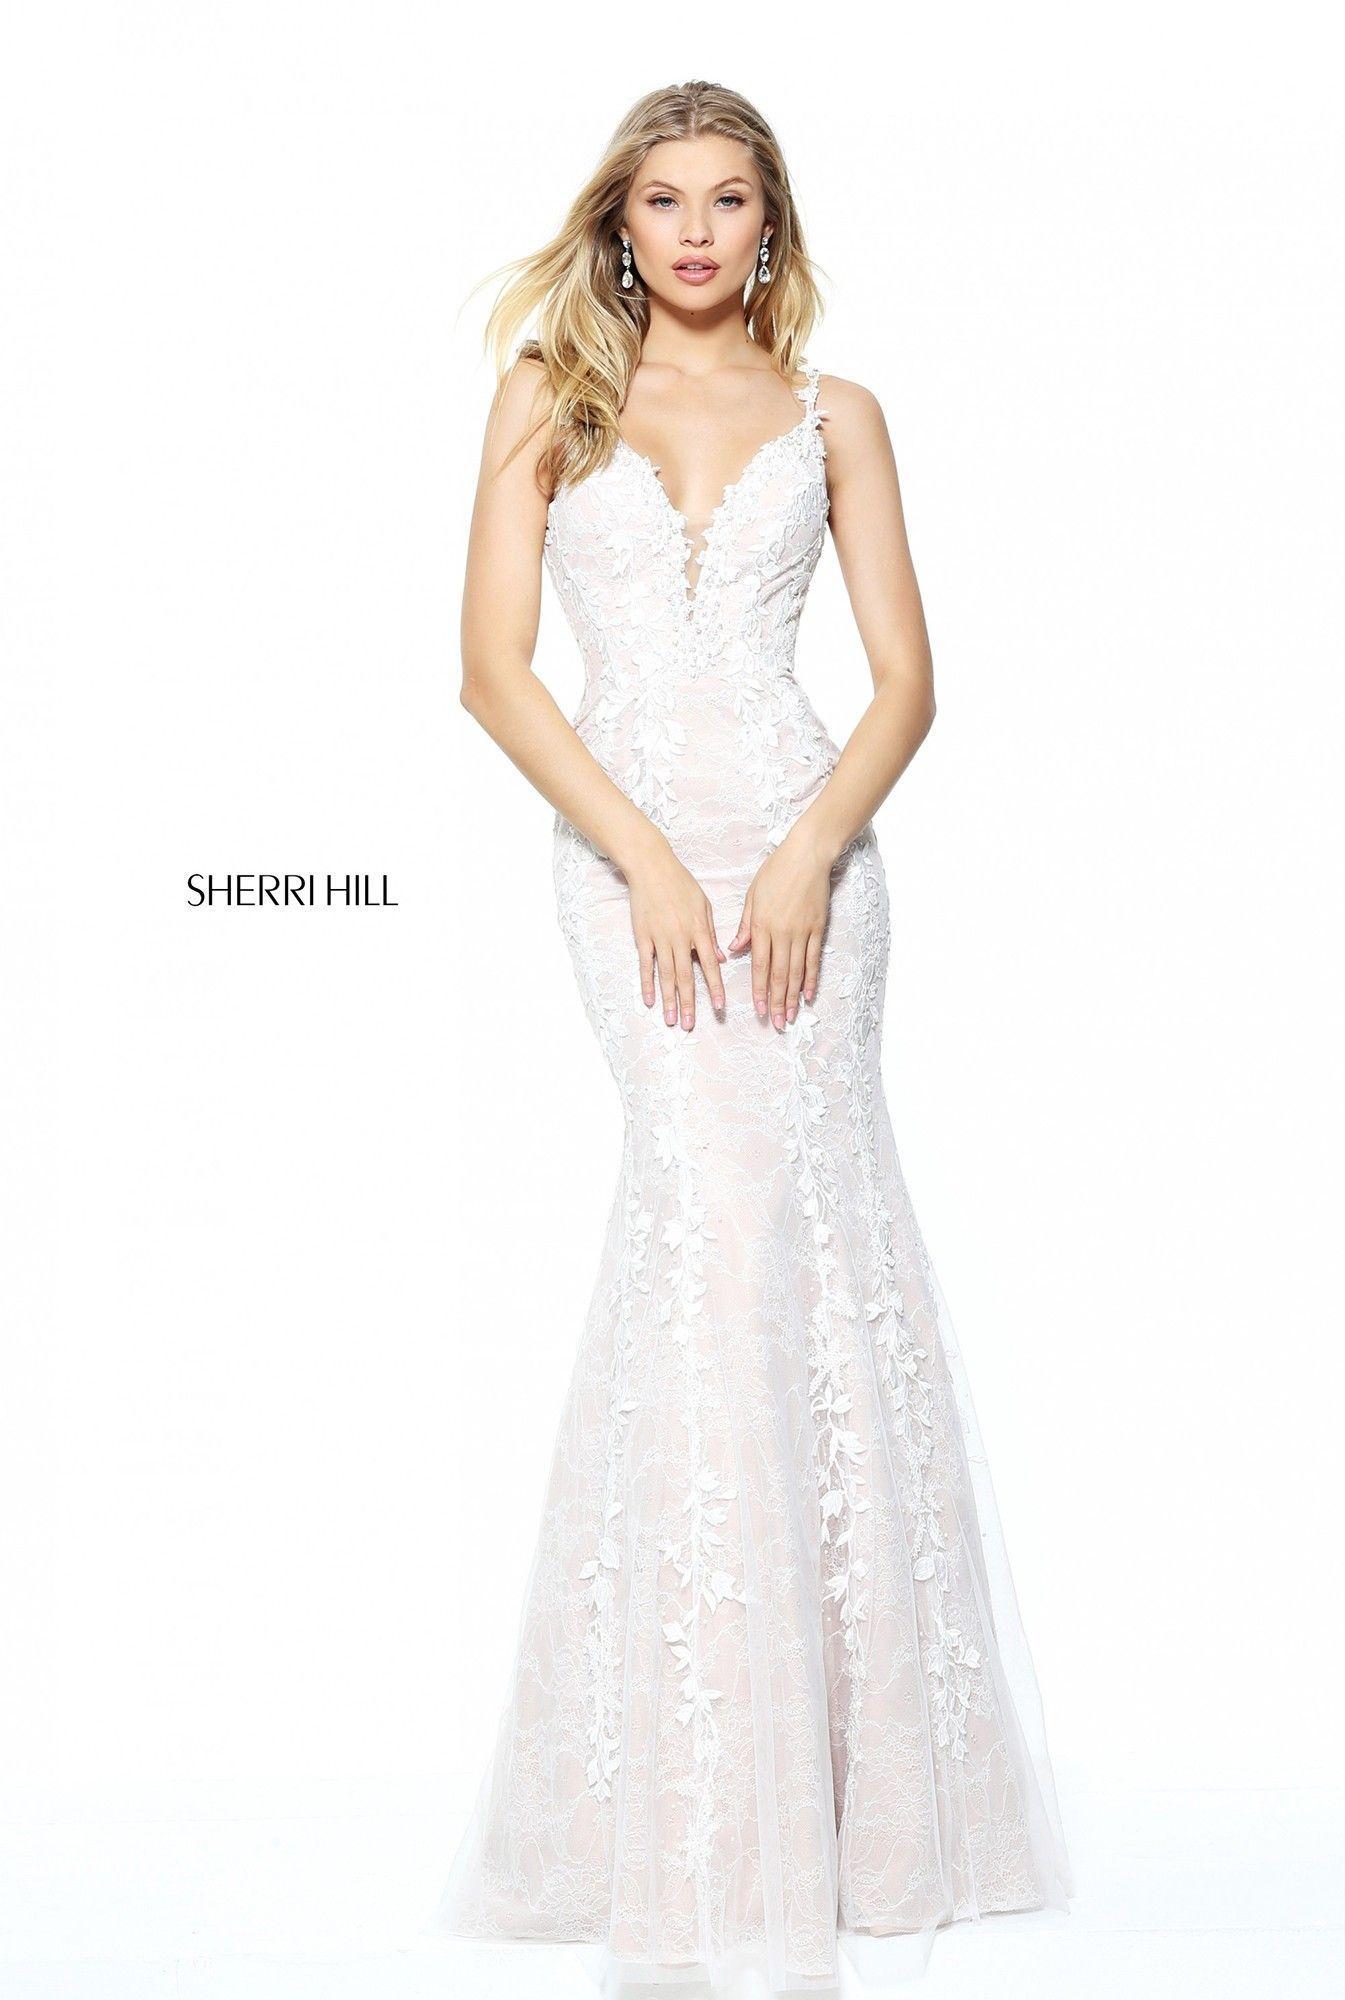 Sherri hill lace wedding dress  Sherri Hill  Plunge Illusion Lace Gown  Illusions Hourglass